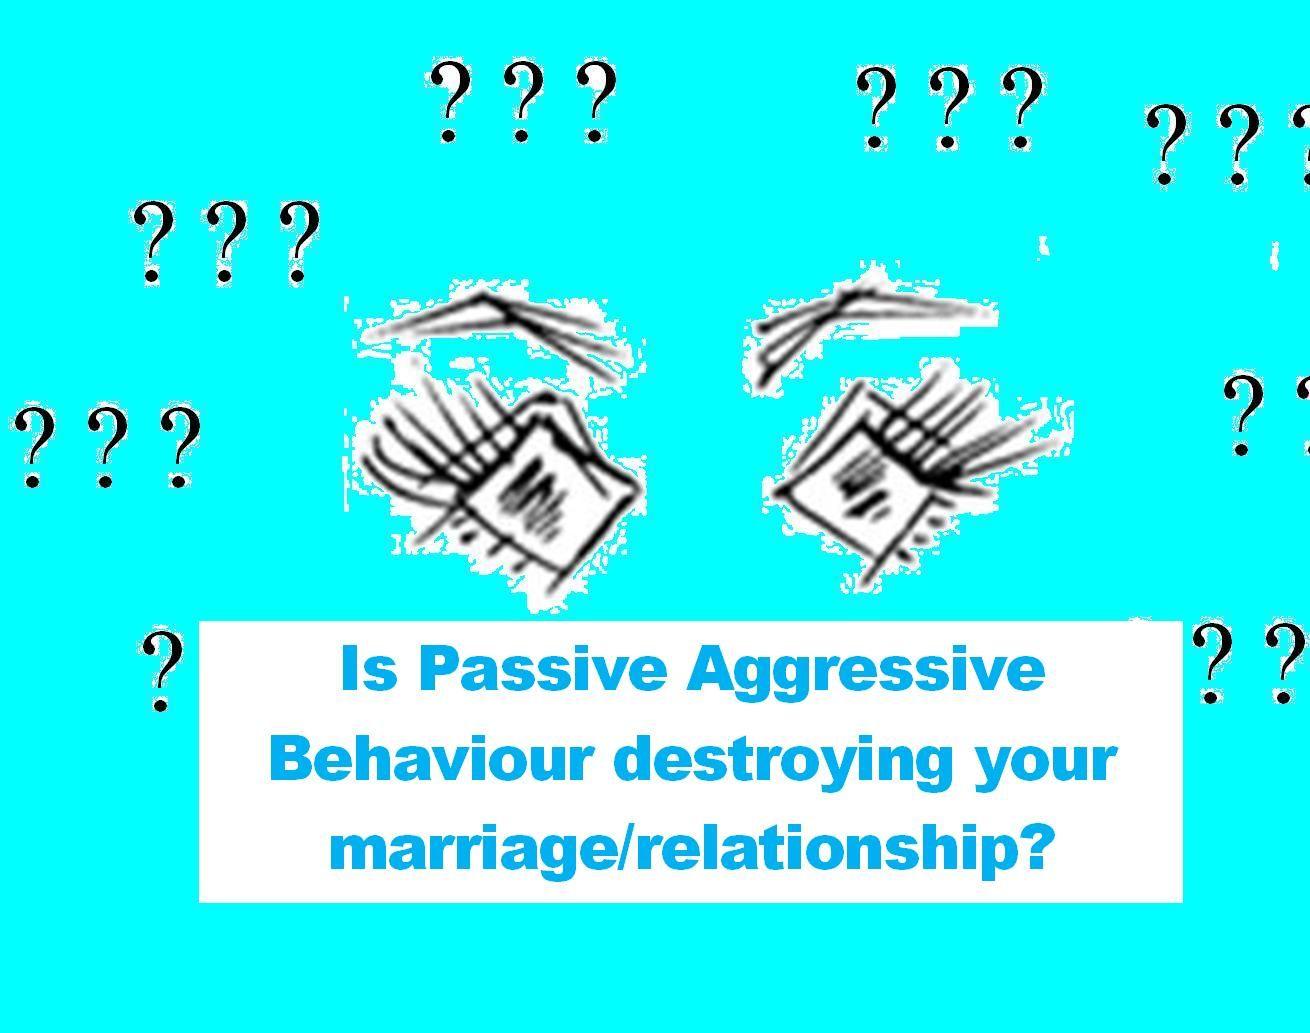 Passive aggressive behaviour in marriage